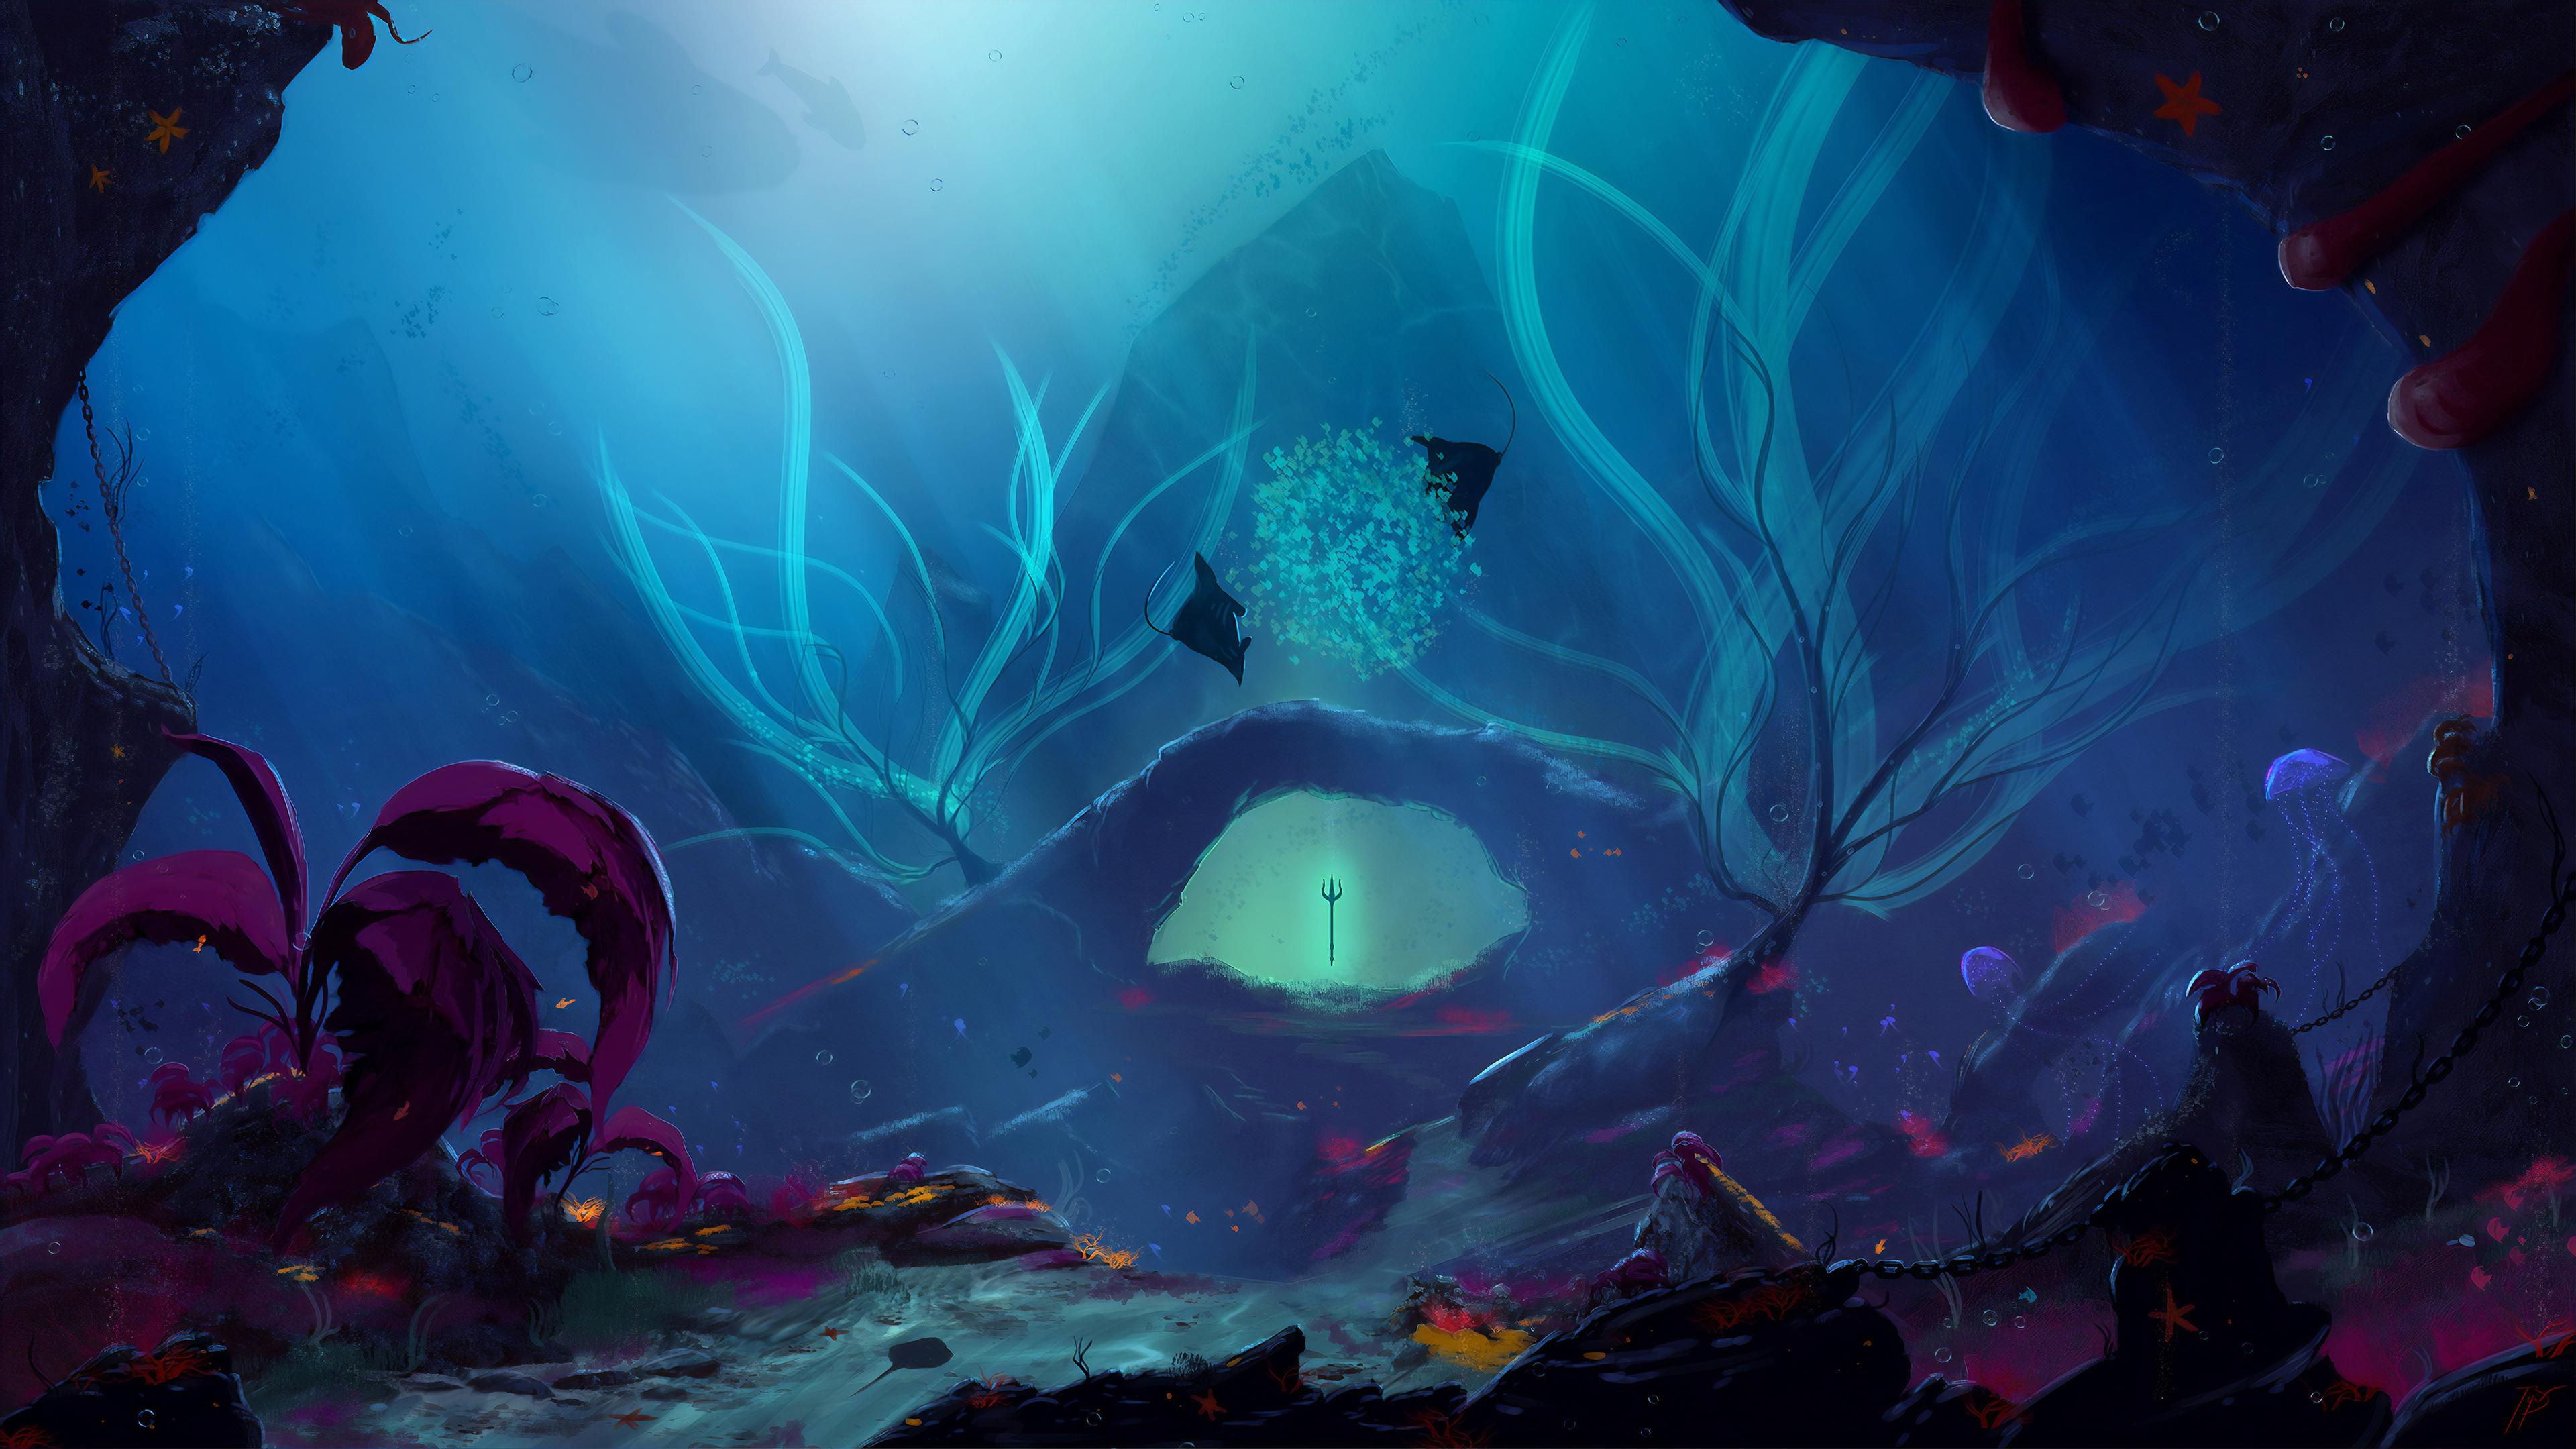 Trident Underwater 4k Hd Artist 4k Wallpapers Images